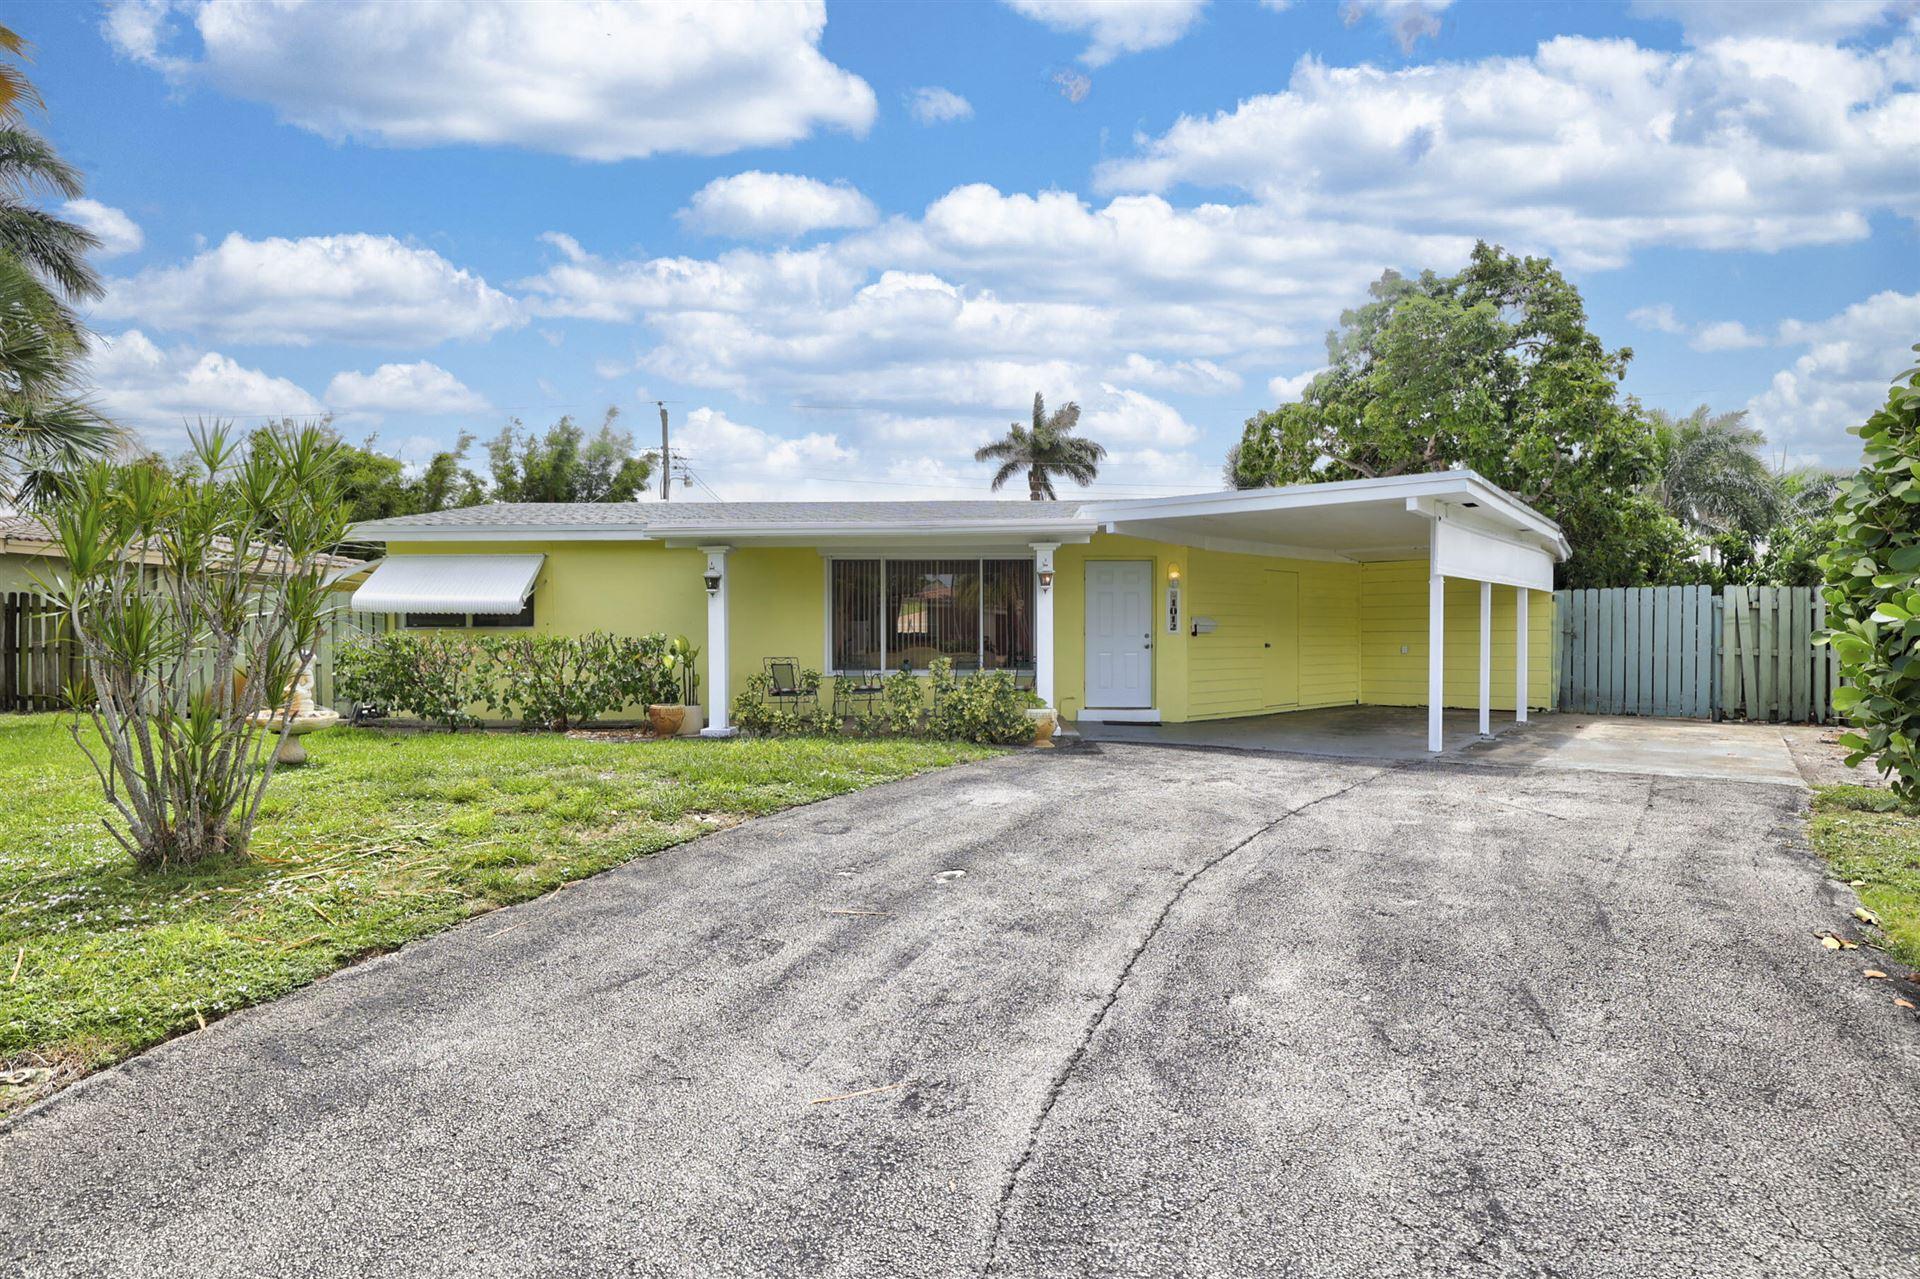 1012 SE 14 Court, Deerfield Beach, FL 33441 - MLS#: RX-10741687